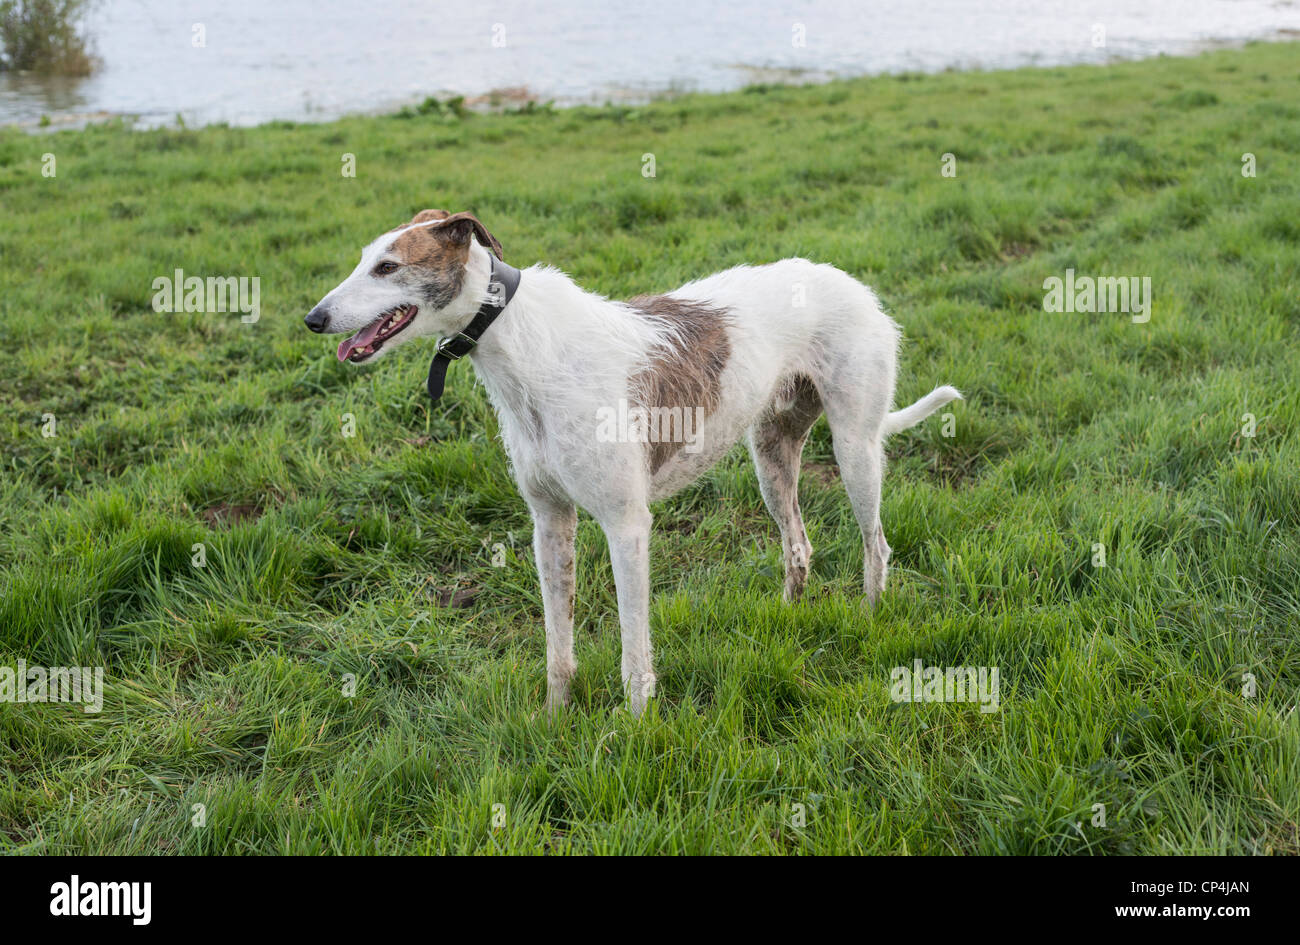 Lurcher standing on grass Stock Photo